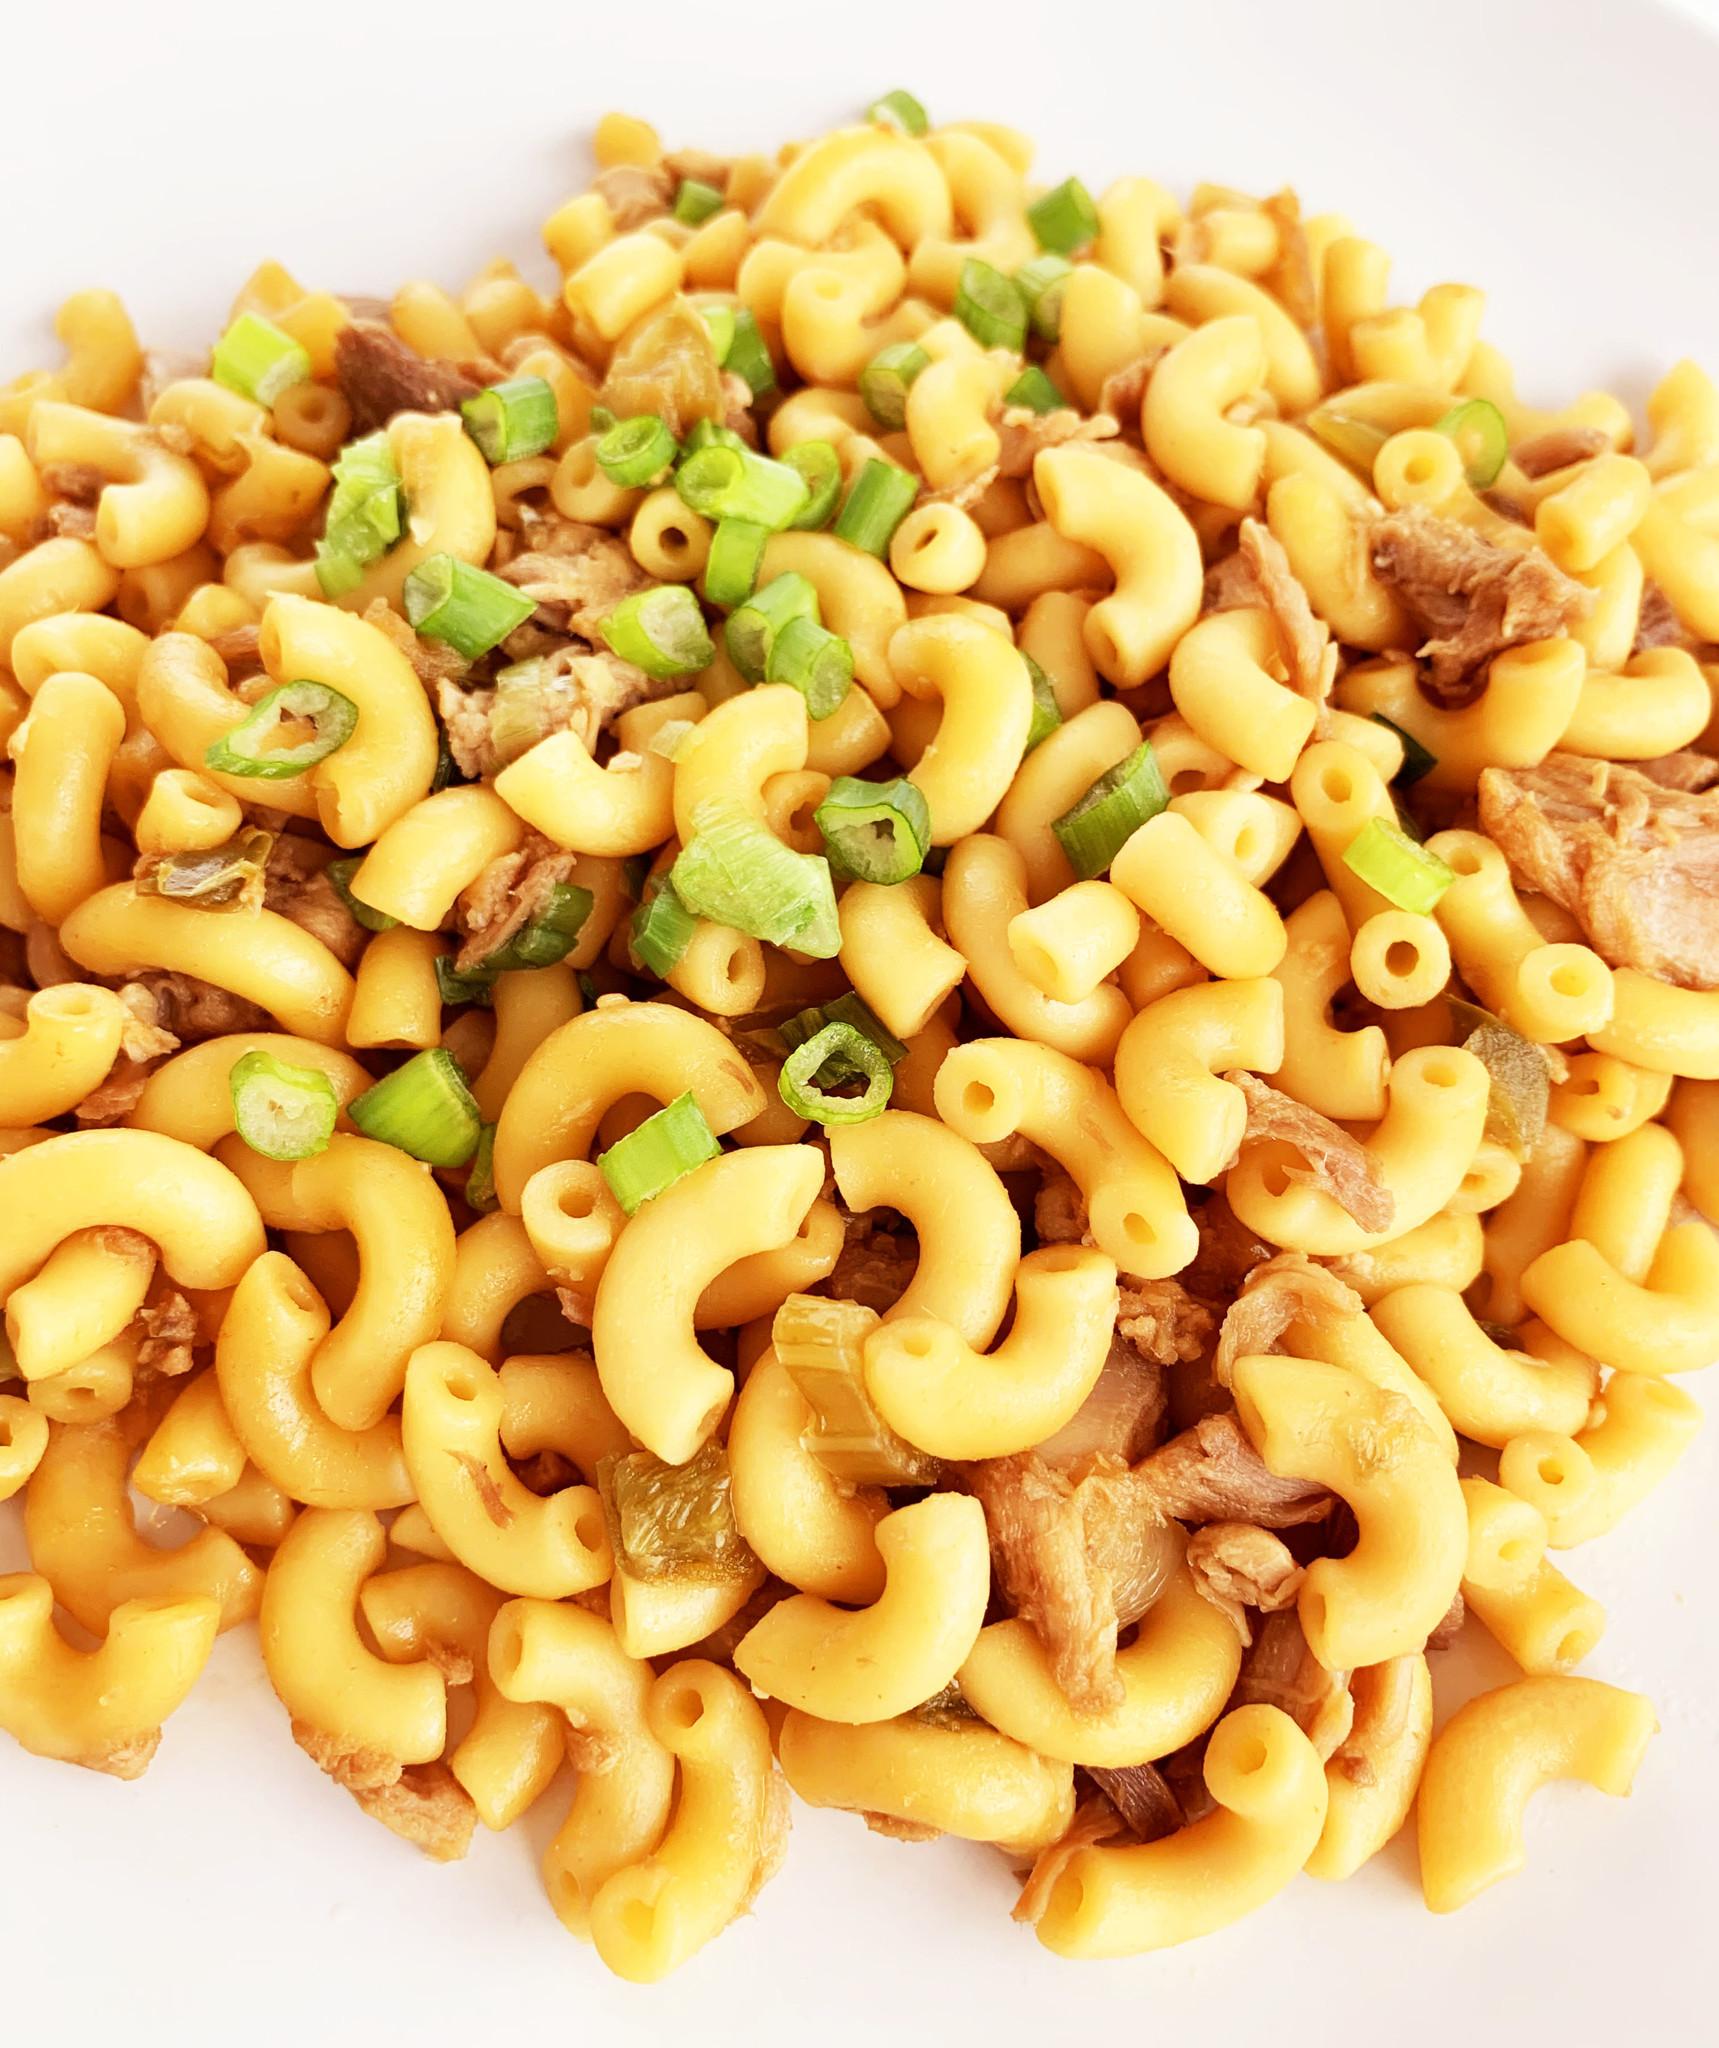 Nouilles chinoises (325g)